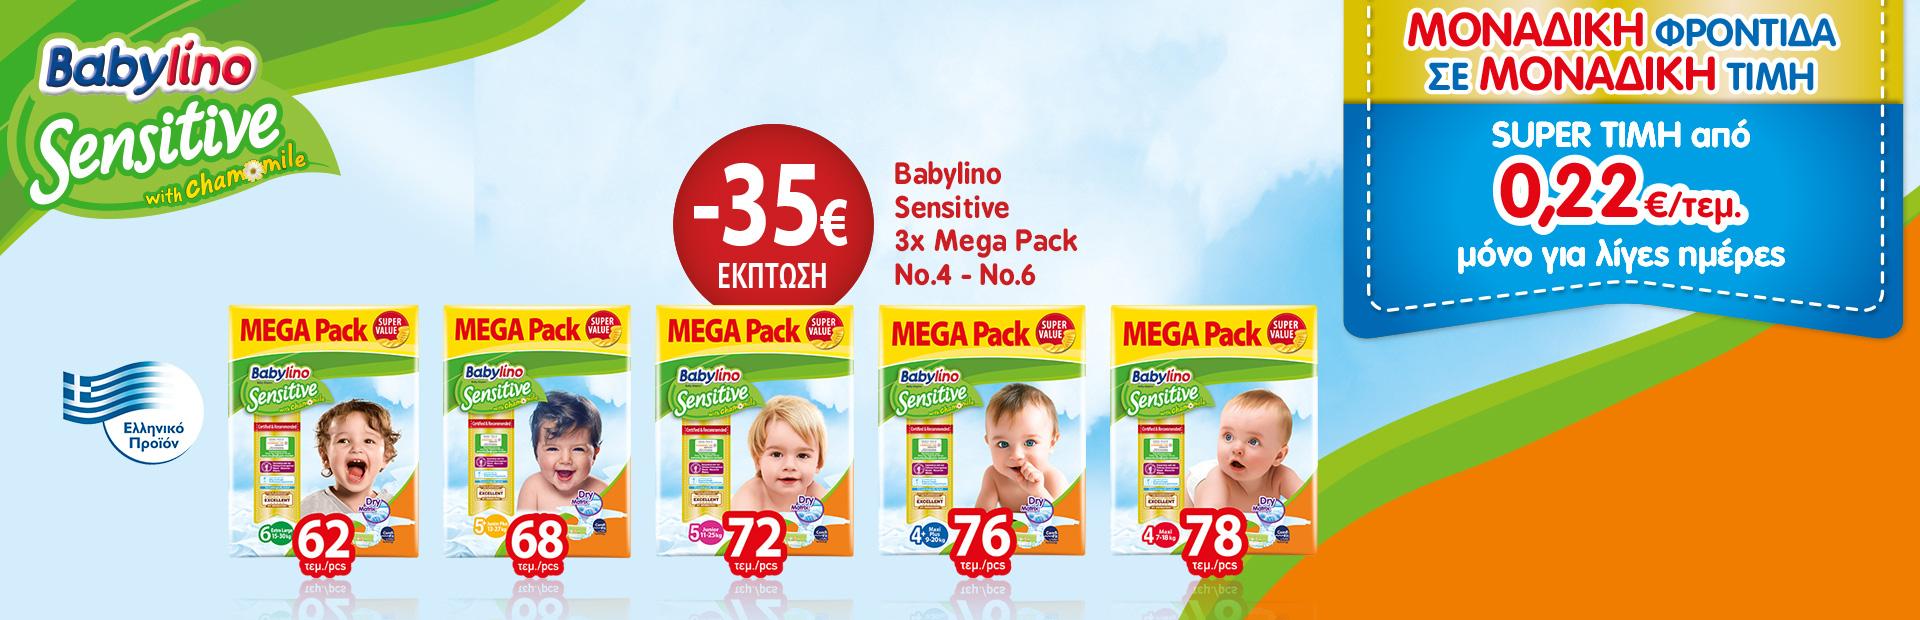 BABYLINO mega pack